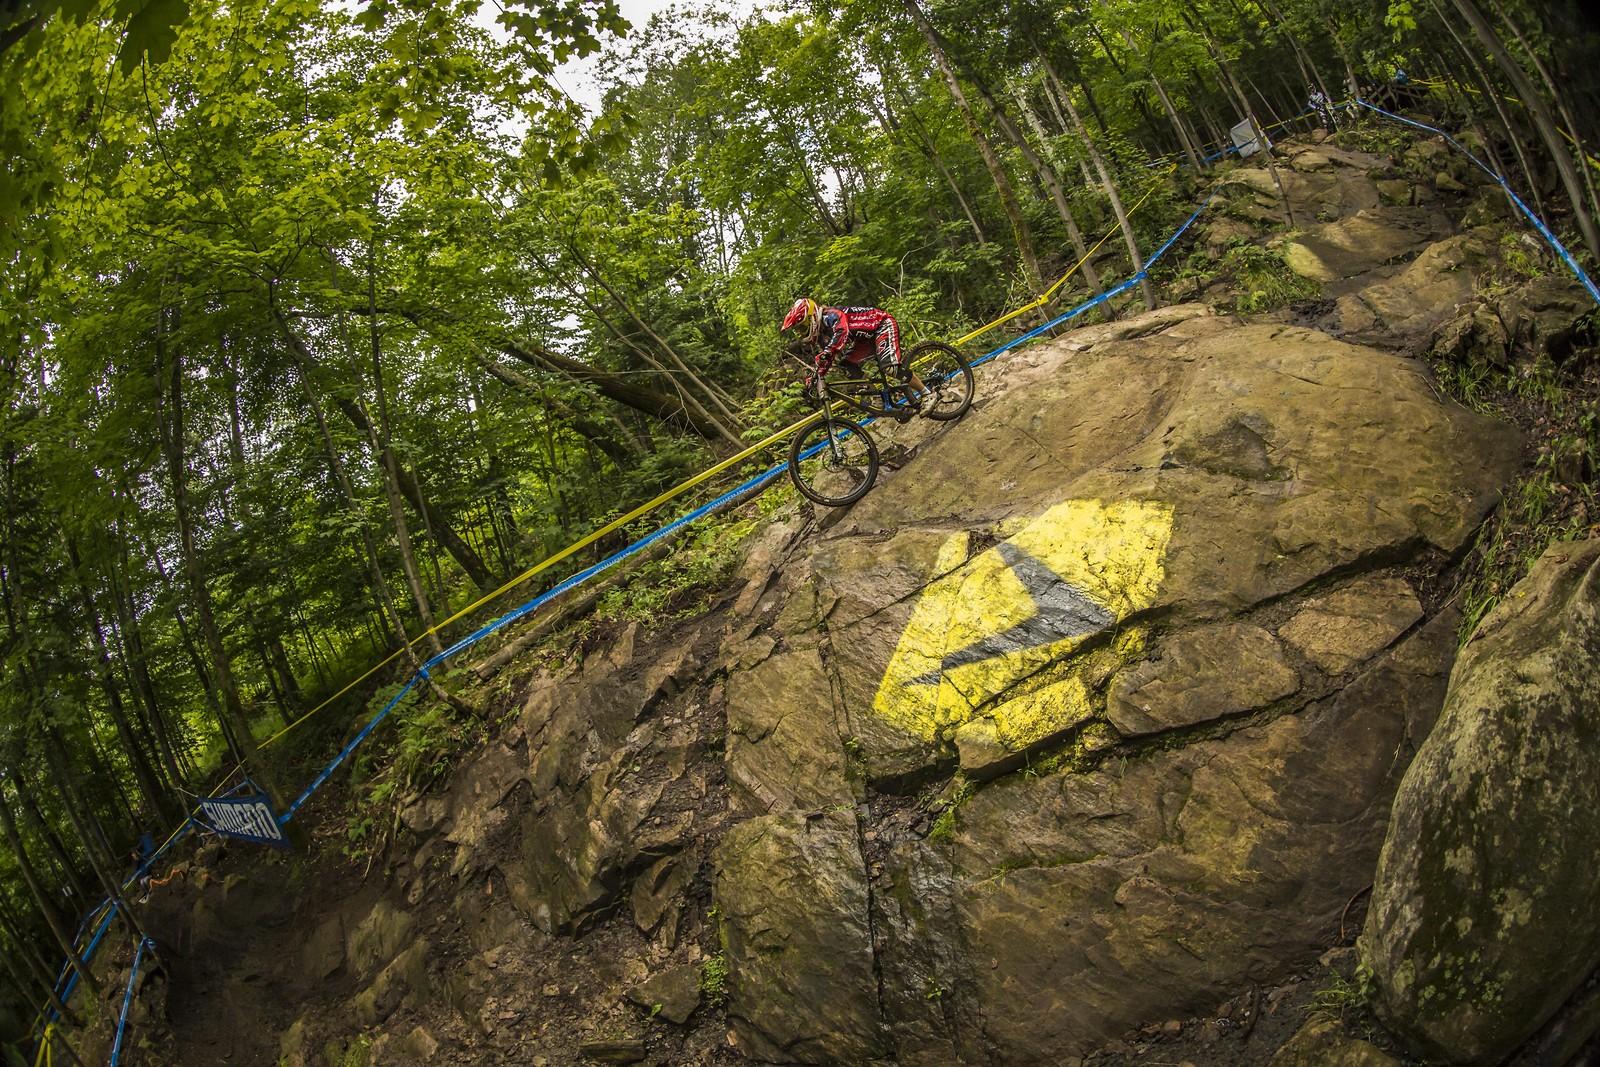 katy curd msa 2015 - phunkt.com - Mountain Biking Pictures - Vital MTB